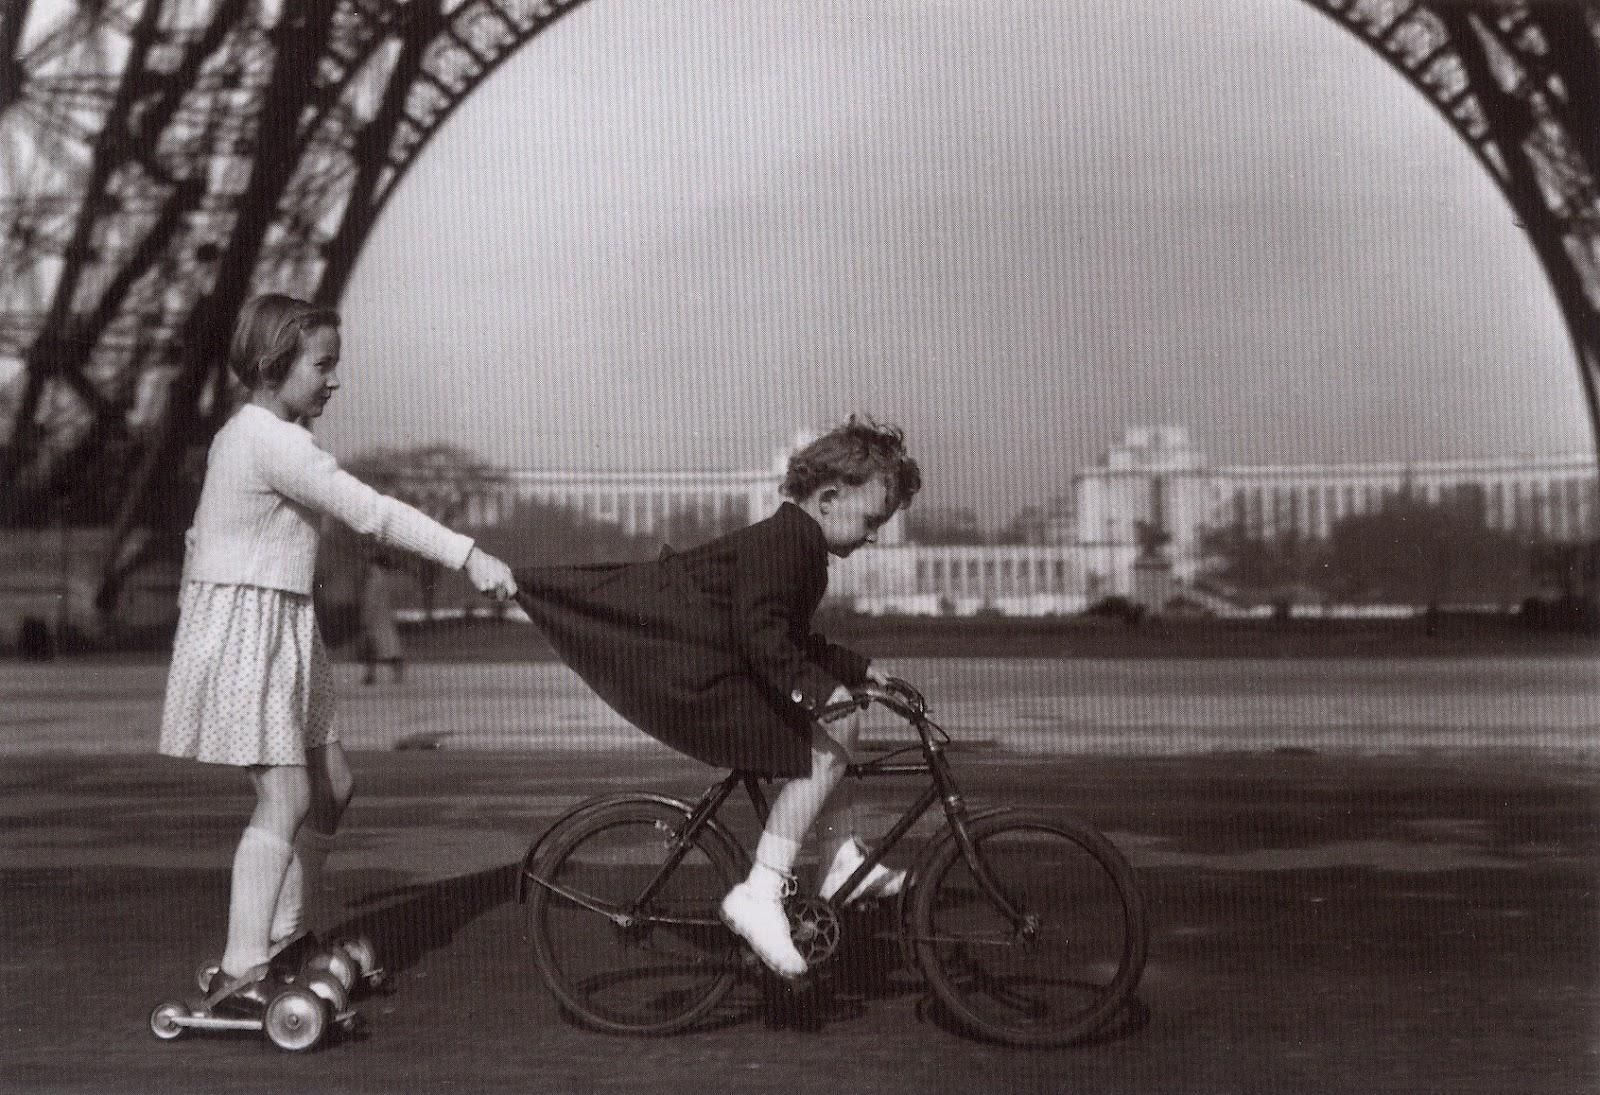 http://4.bp.blogspot.com/-HtWYYQCeNtc/T4id8KwmUgI/AAAAAAAAAi8/TKRkE1SzPM8/s1600/robert-doisneau-1943-le-remorqueur-du-champ-de-mars.jpg